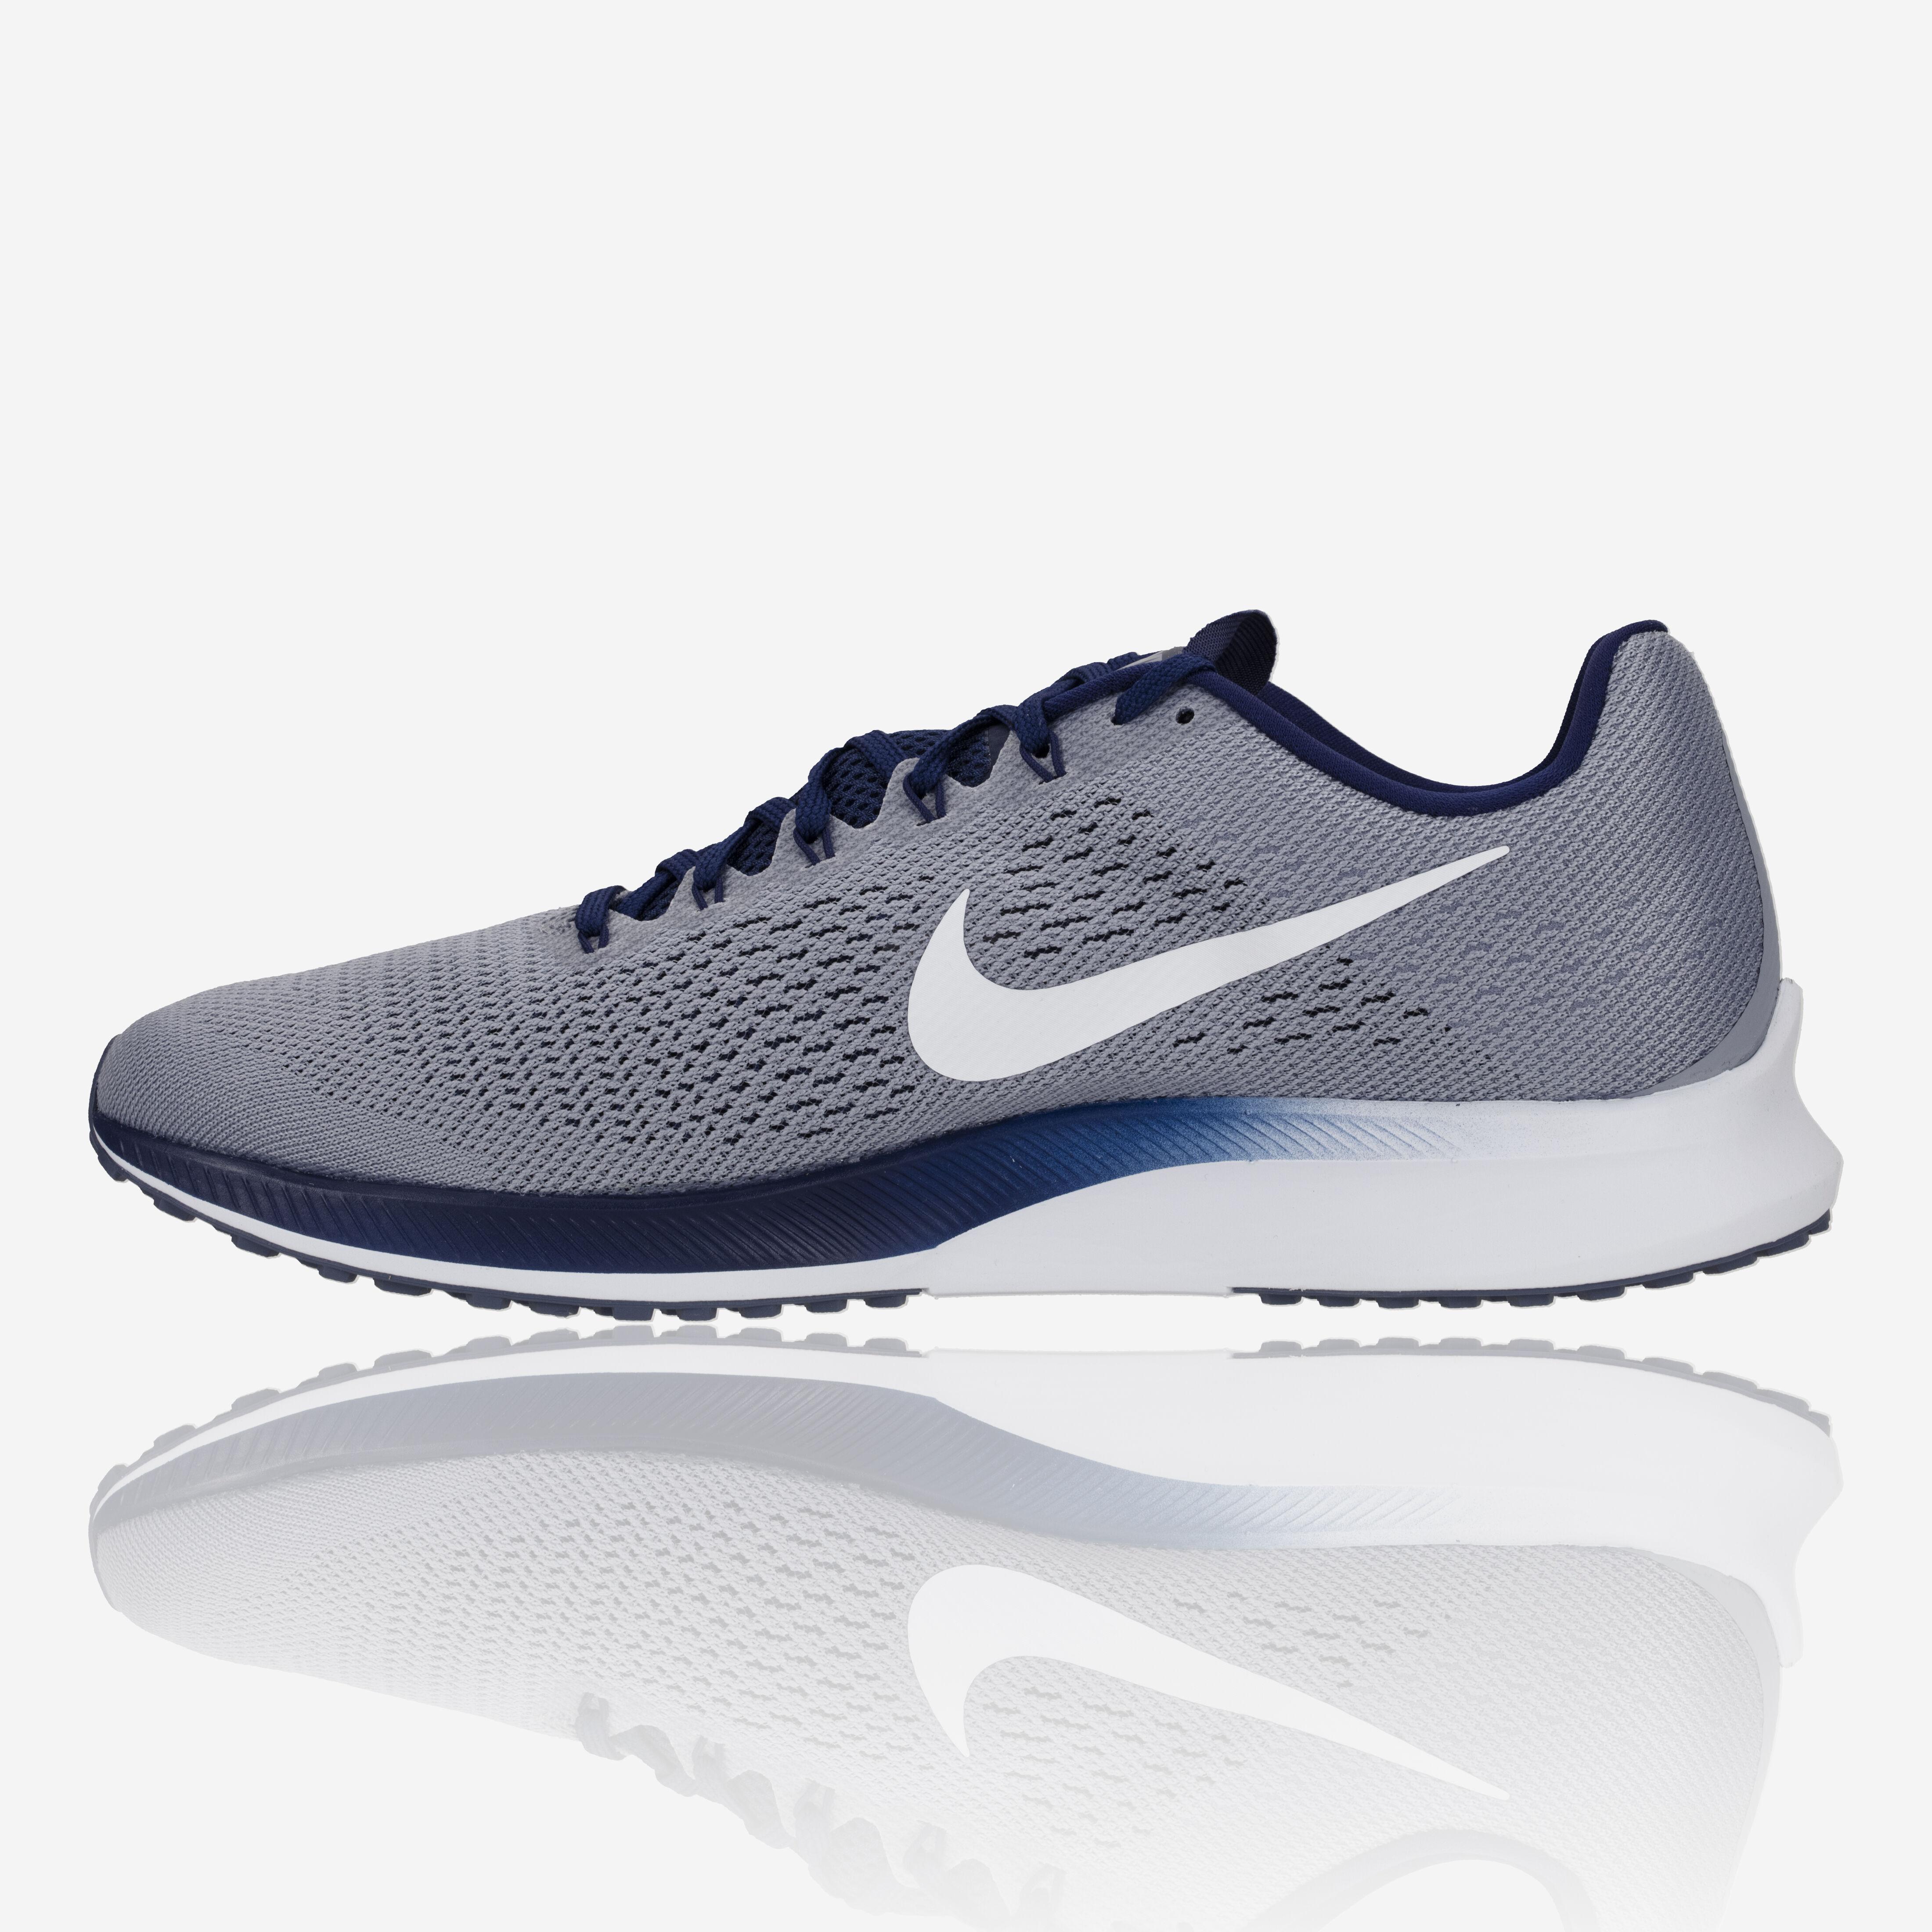 best website cbcf7 d87df Nike Air Zoom Elite 10 shoes 2019